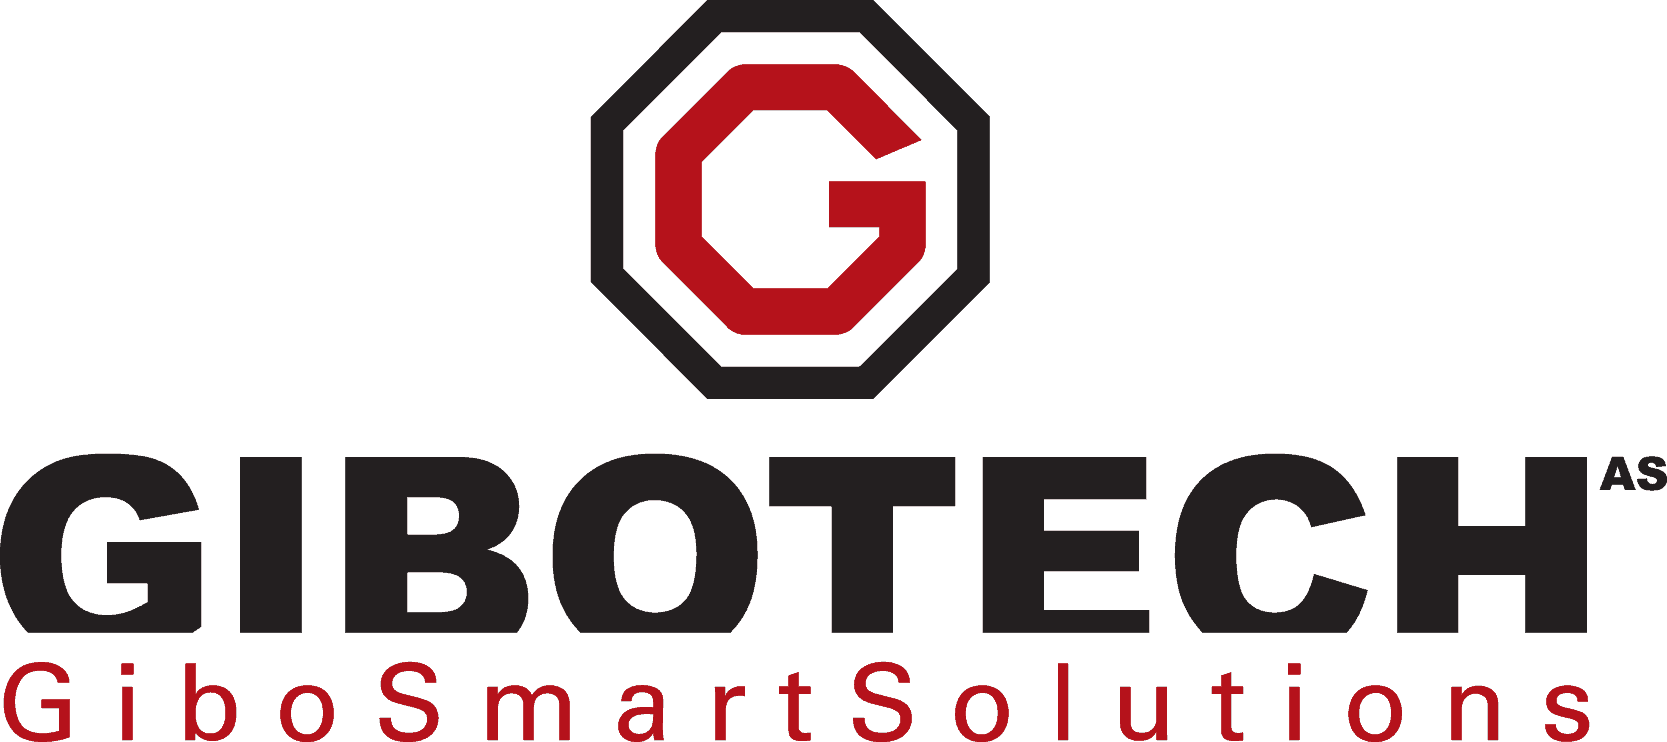 , Vi introducerer GiboSmartSolutions, Gibotech